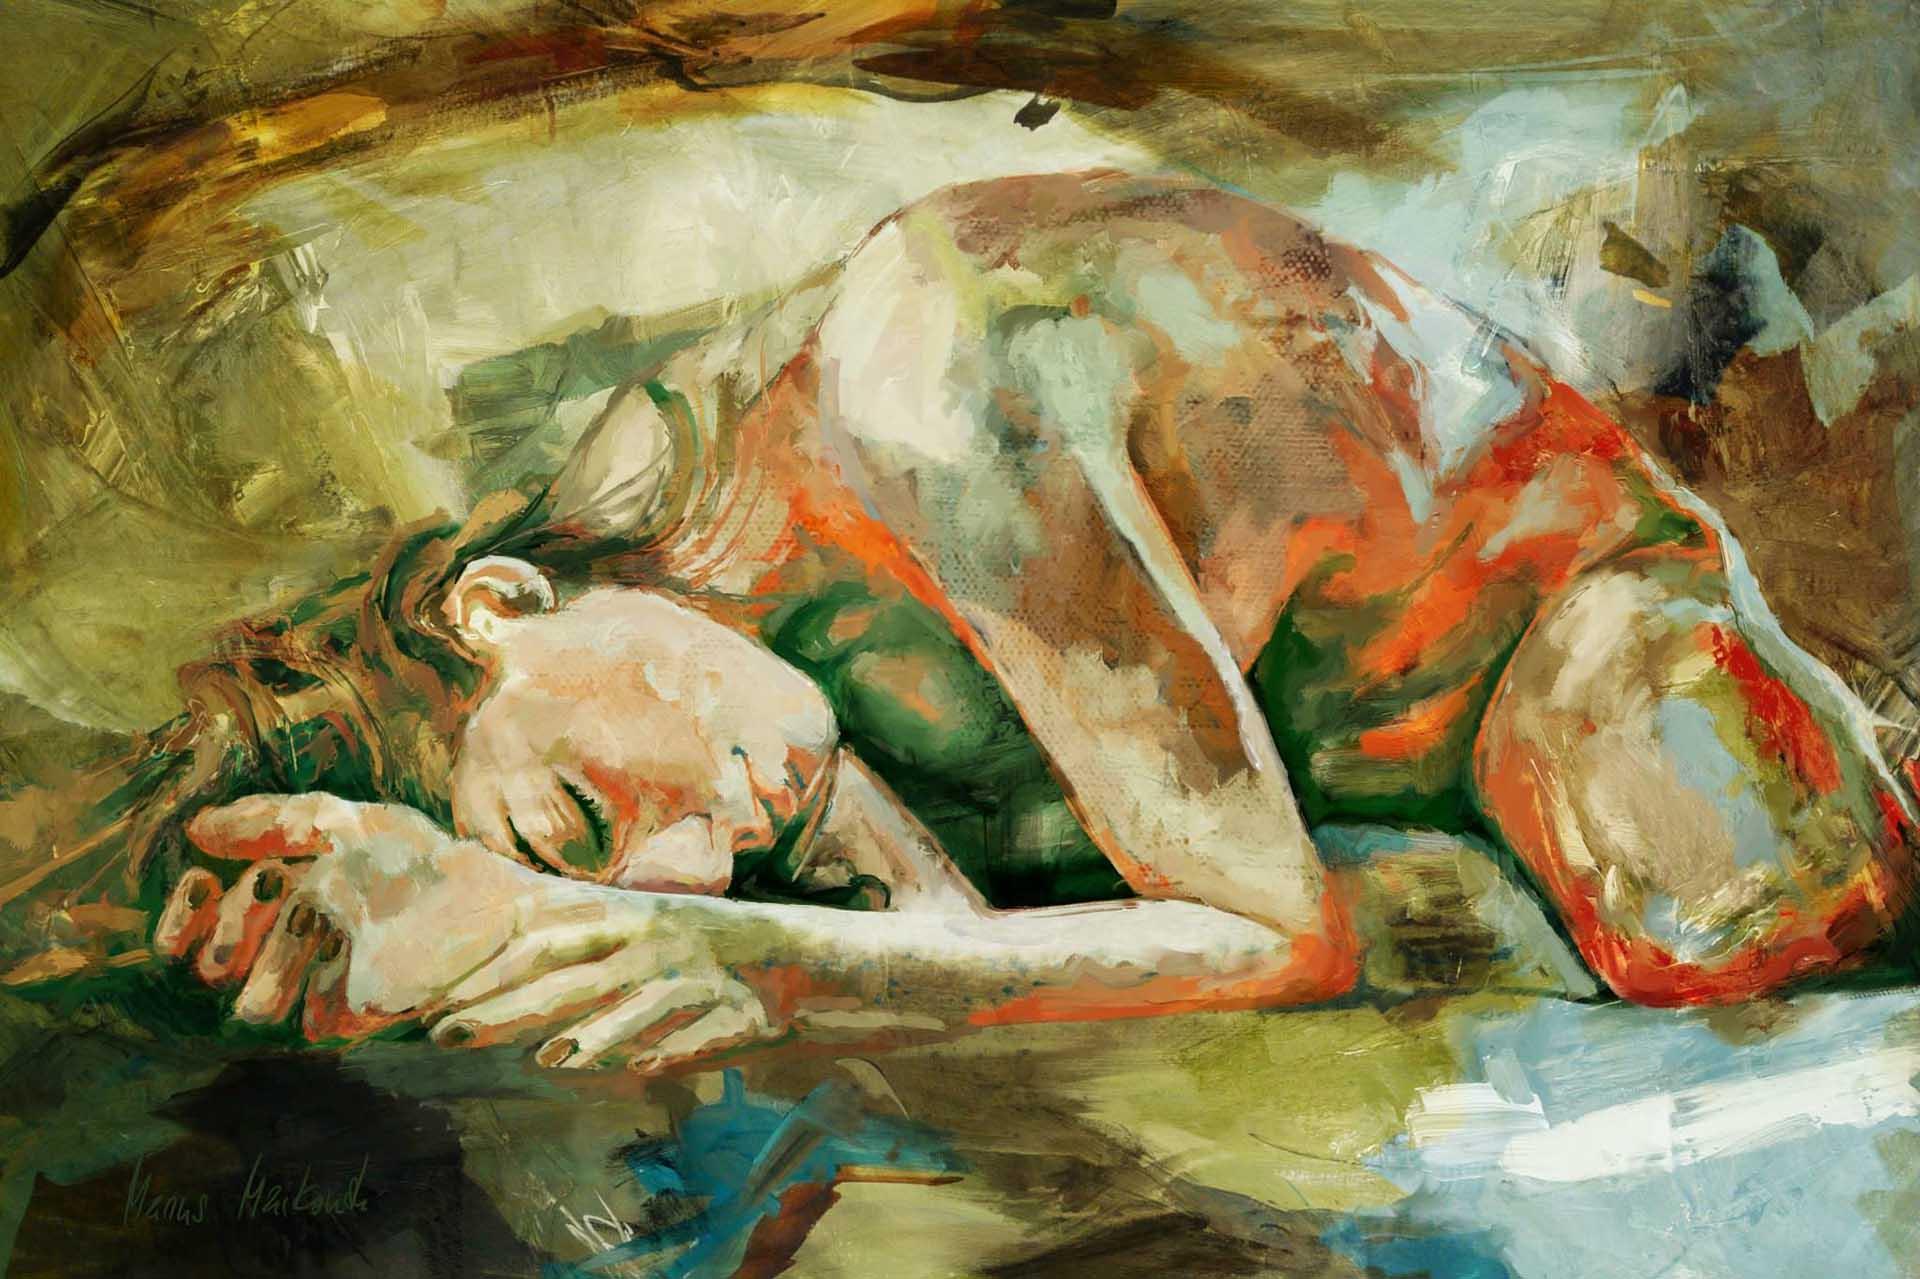 Мариус Марковски (Marius Markowski), Digital Paintings – 30